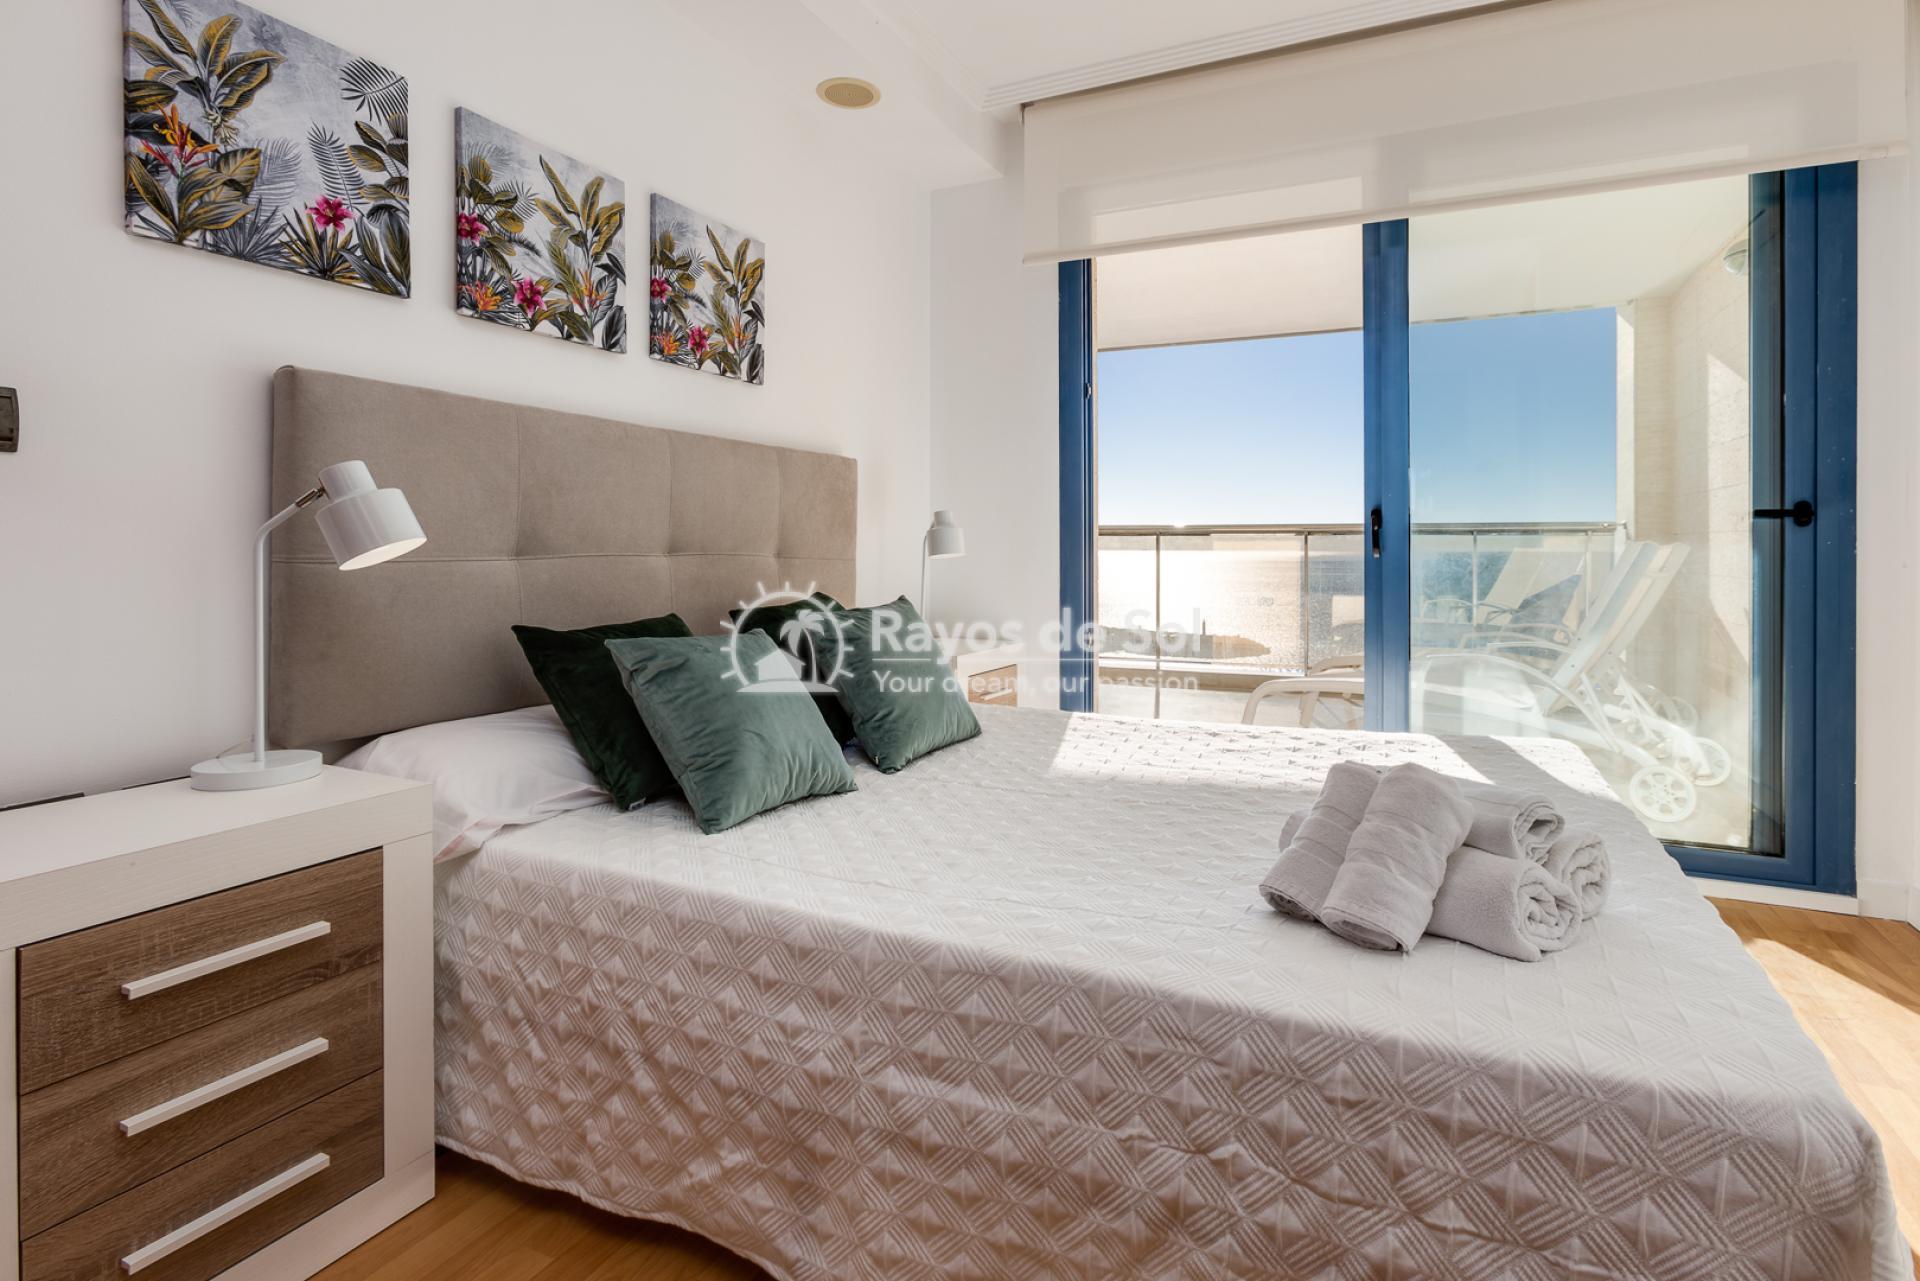 Turnekey first line apartments  in Altea, Costa Blanca (Alteabeach) - 31